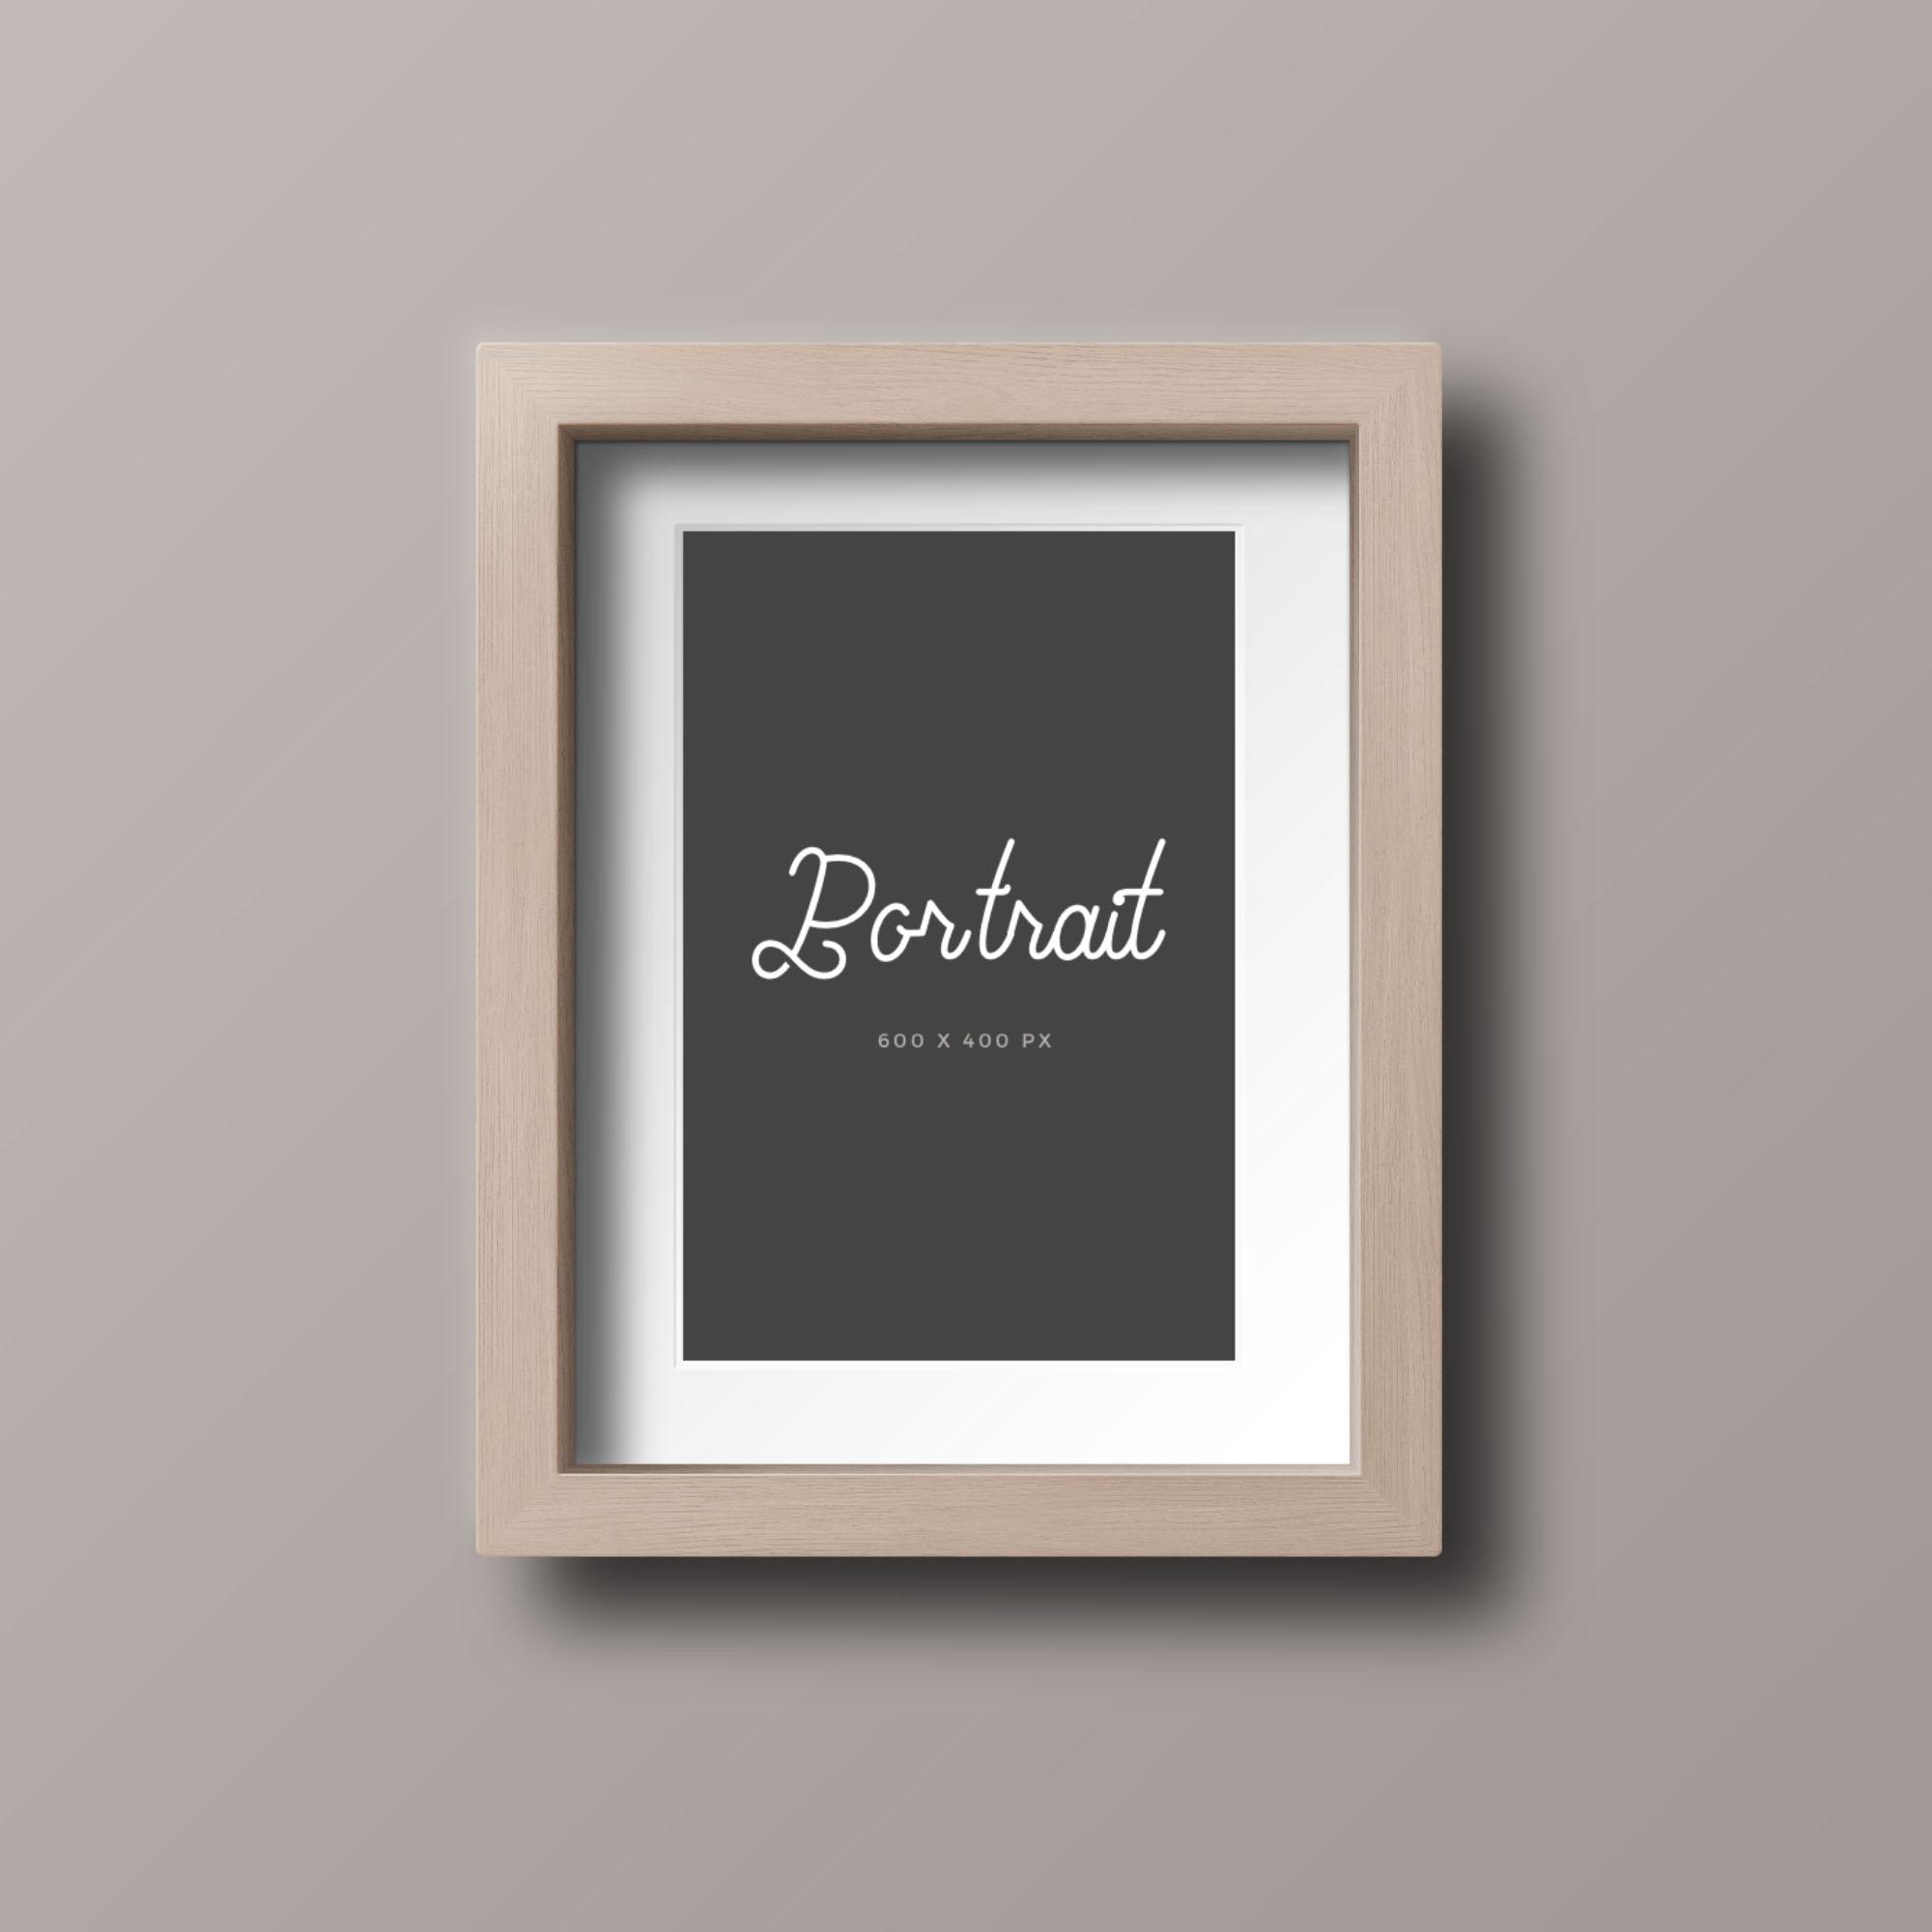 Wood Photo Frame Mockup - Portrait